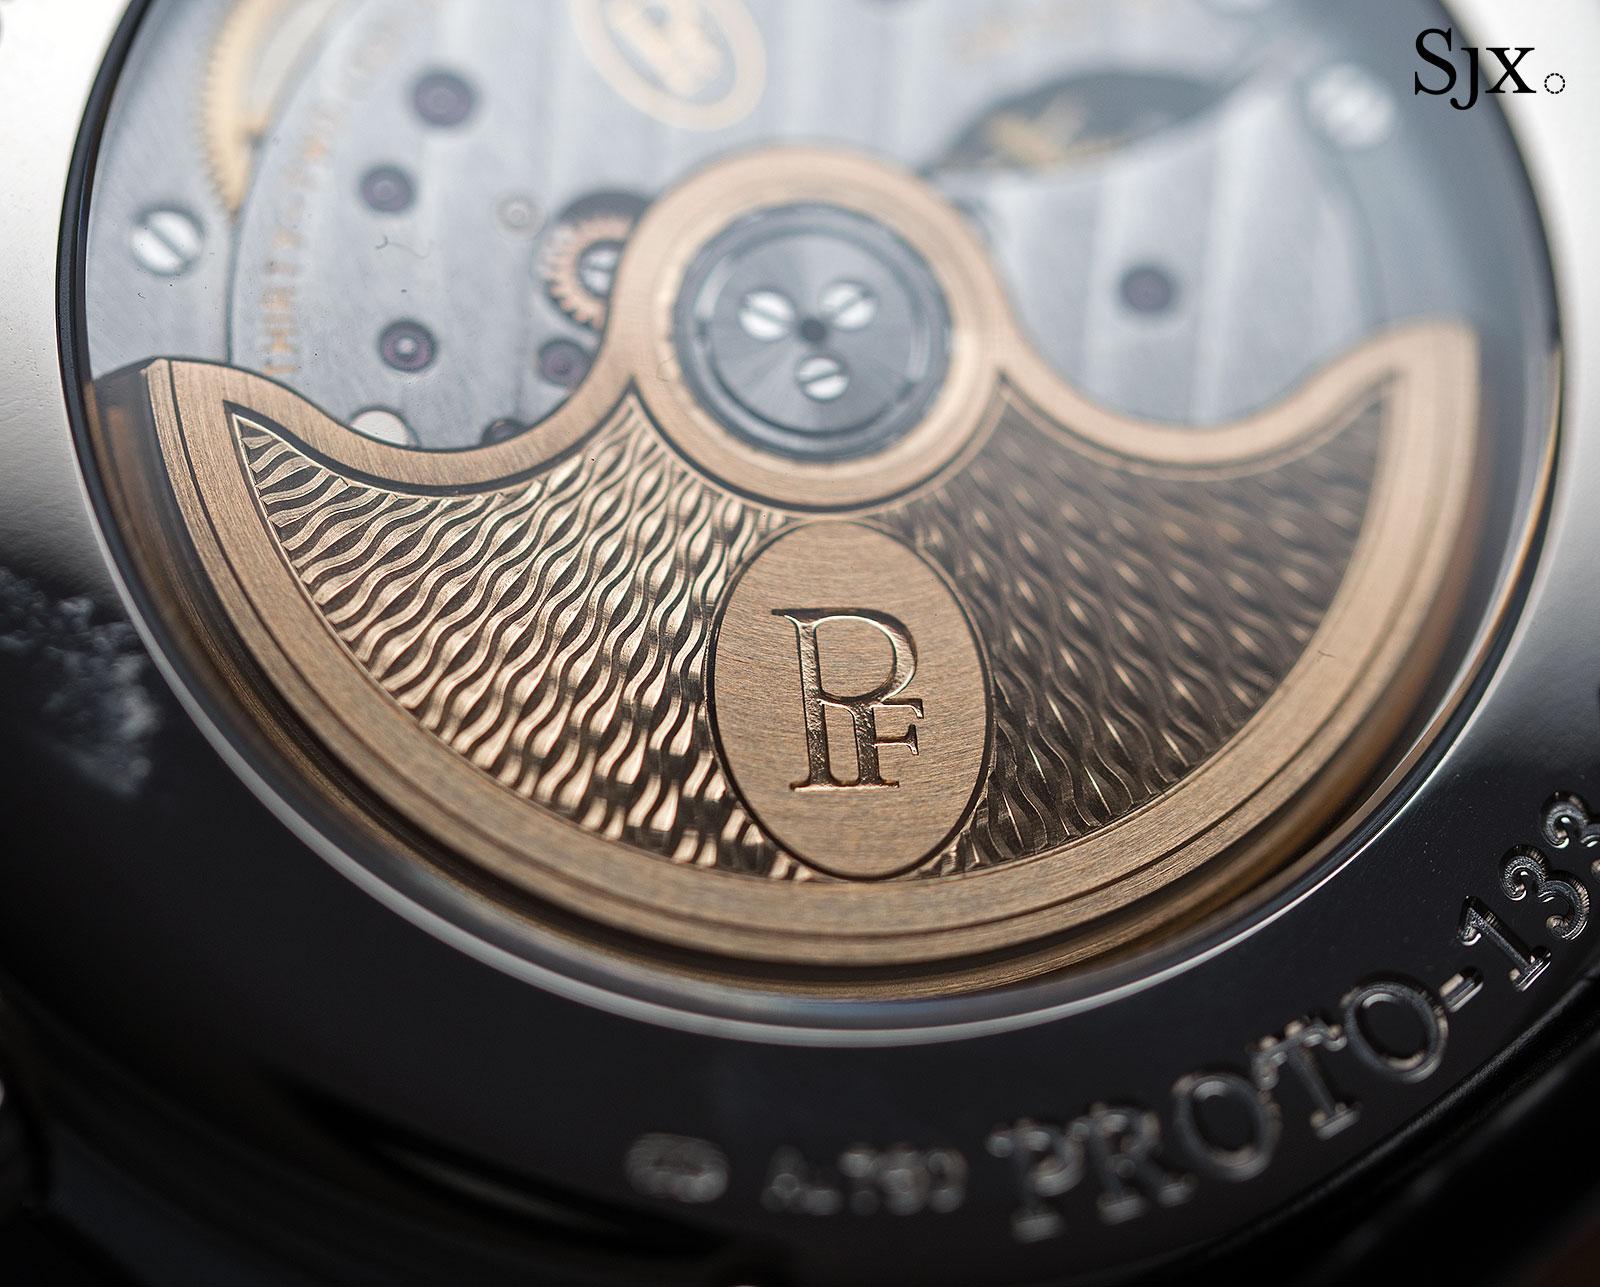 Parmigiani Toric Chronometre 5